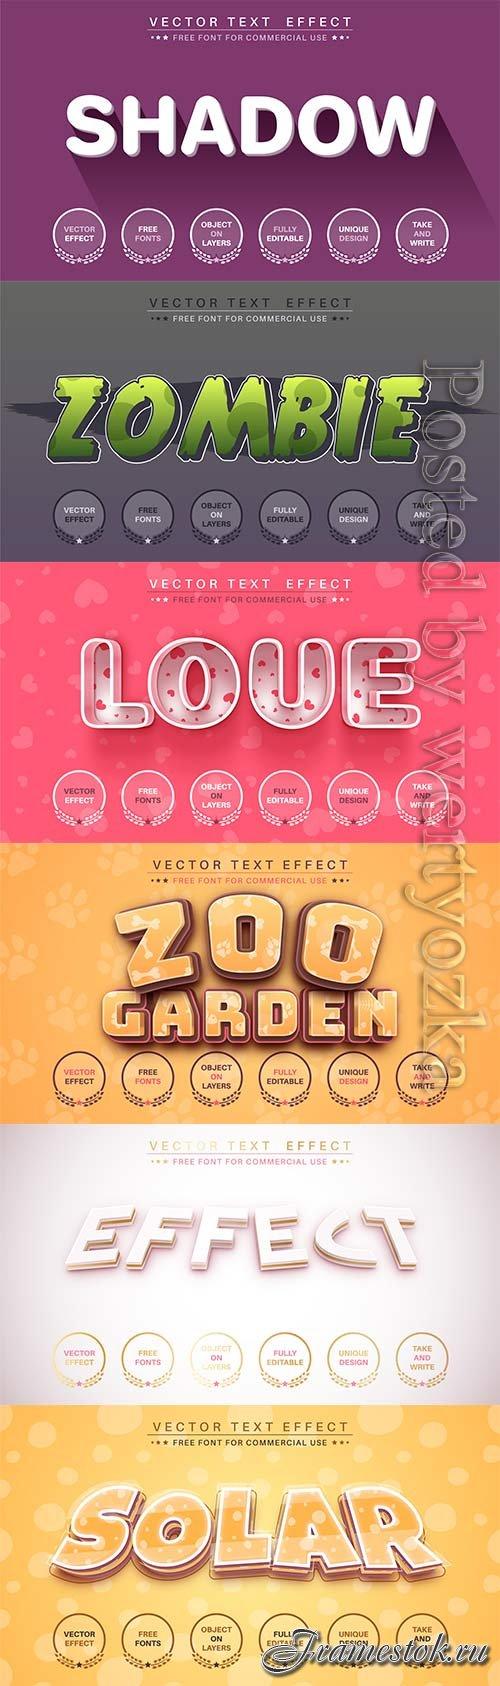 3d editable text style effect vector vol 756